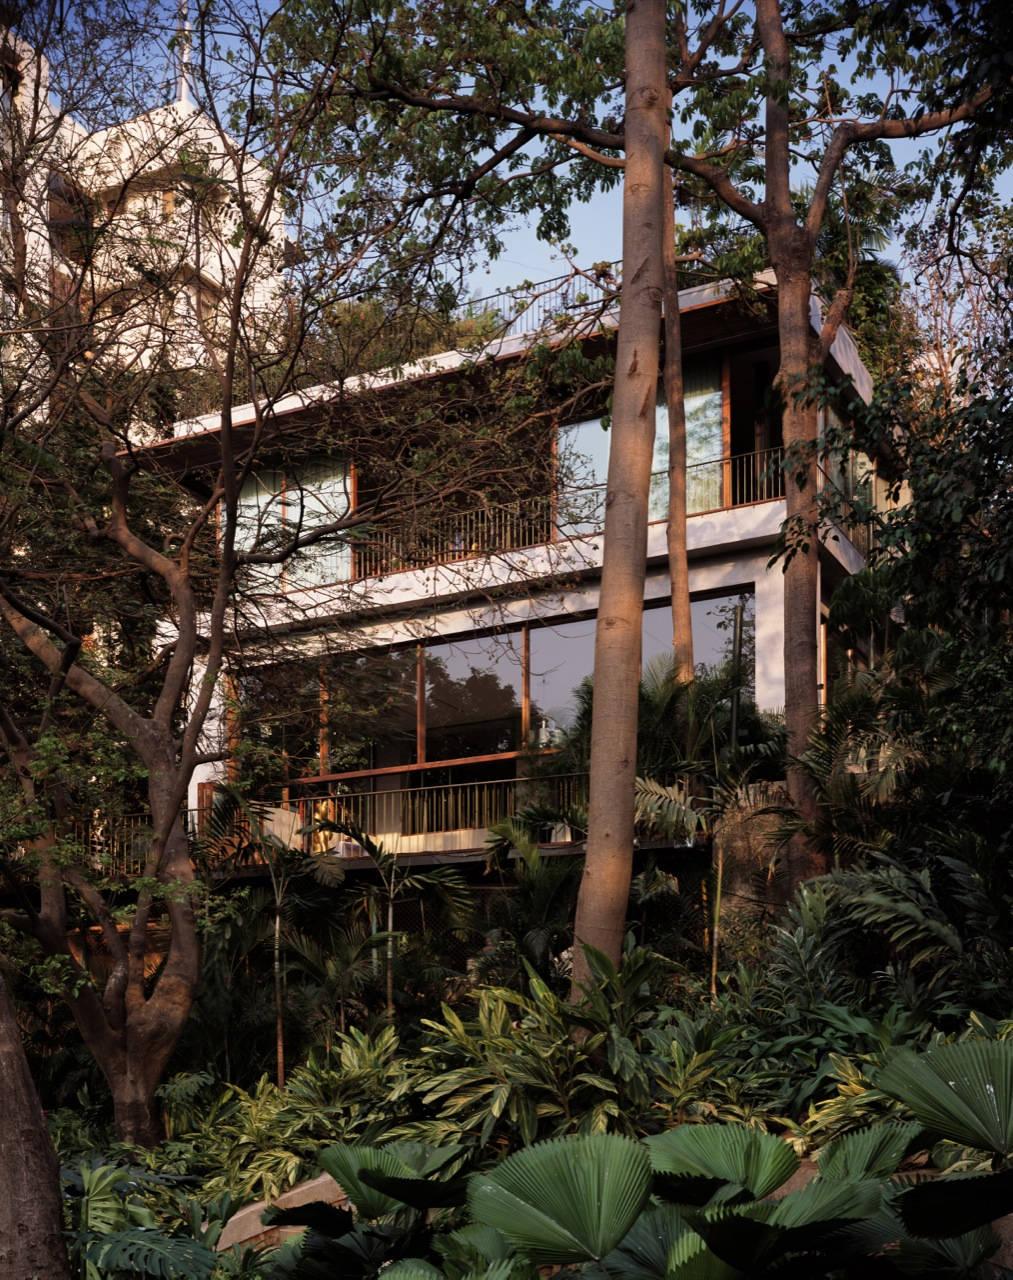 Casa em Pali Hill / Studio Mumbai Architects, © Helene Binet